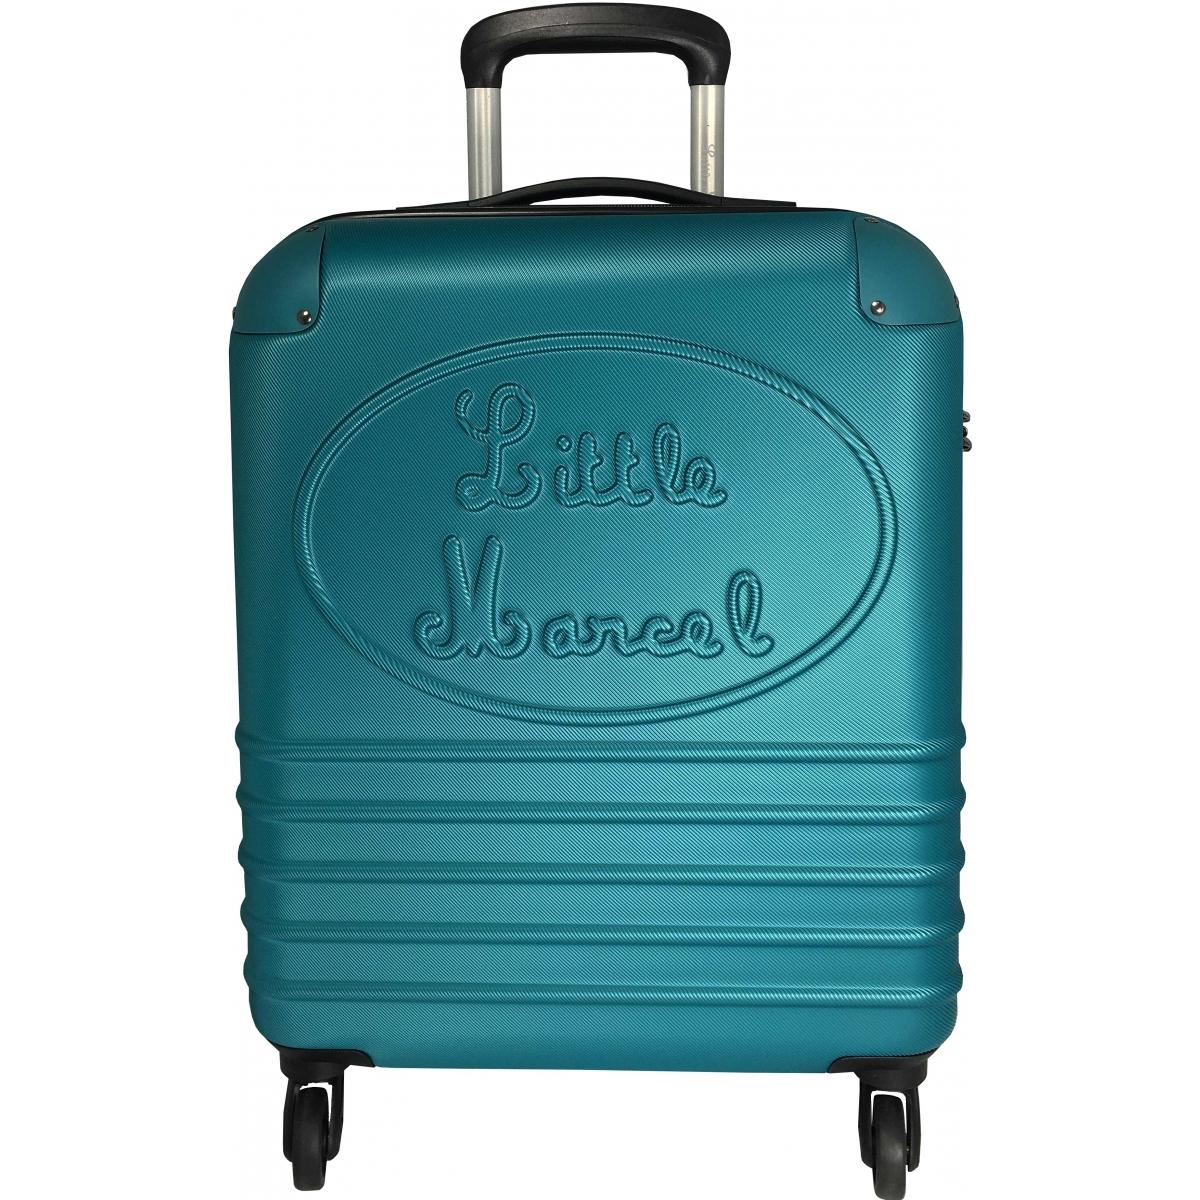 valise cabine little marcel 54 5 cm turquoise ba10221p couleur principale turquoise. Black Bedroom Furniture Sets. Home Design Ideas